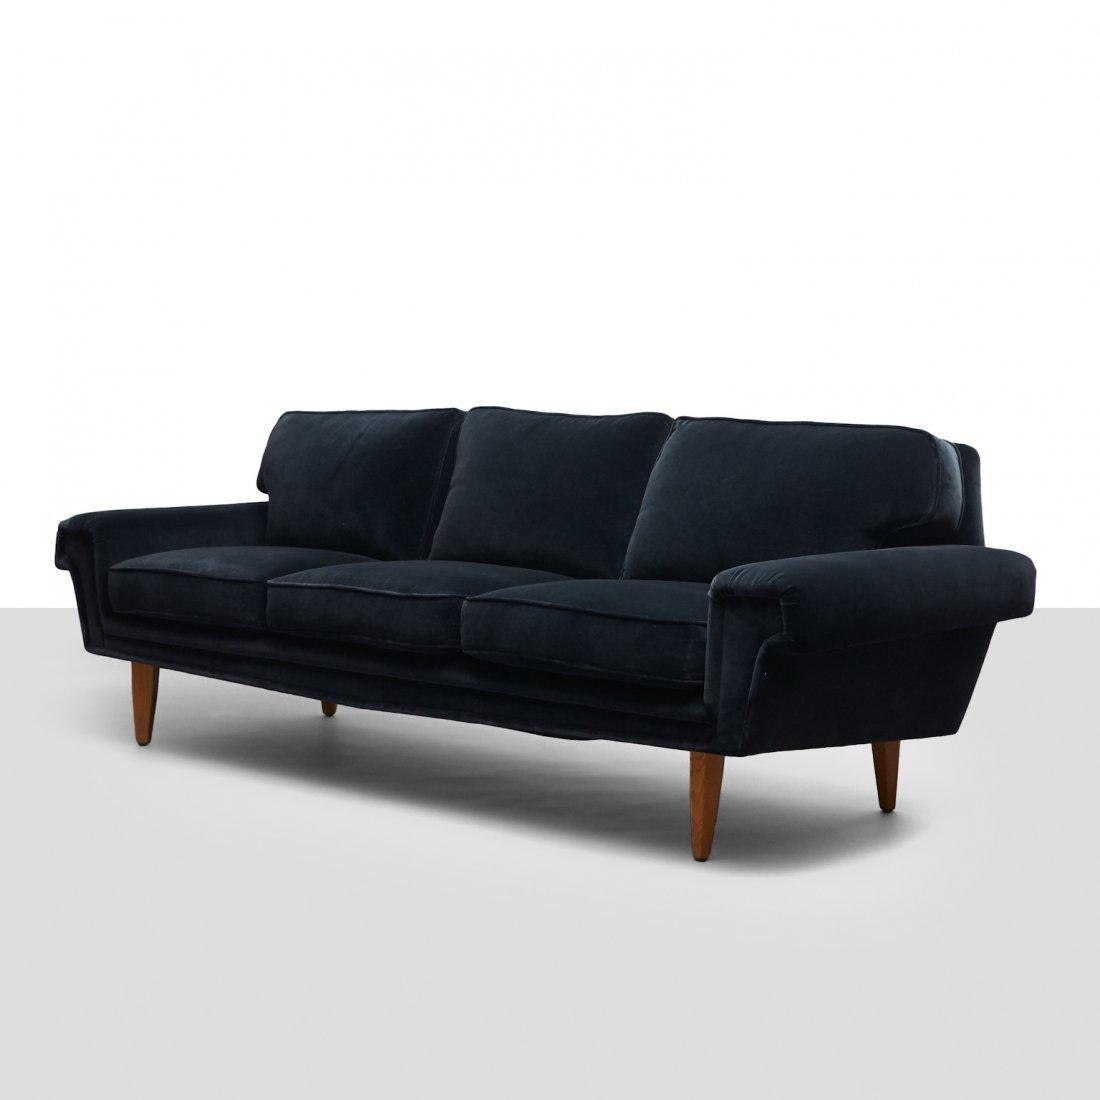 Swedish Design, Three-Seat Sofa